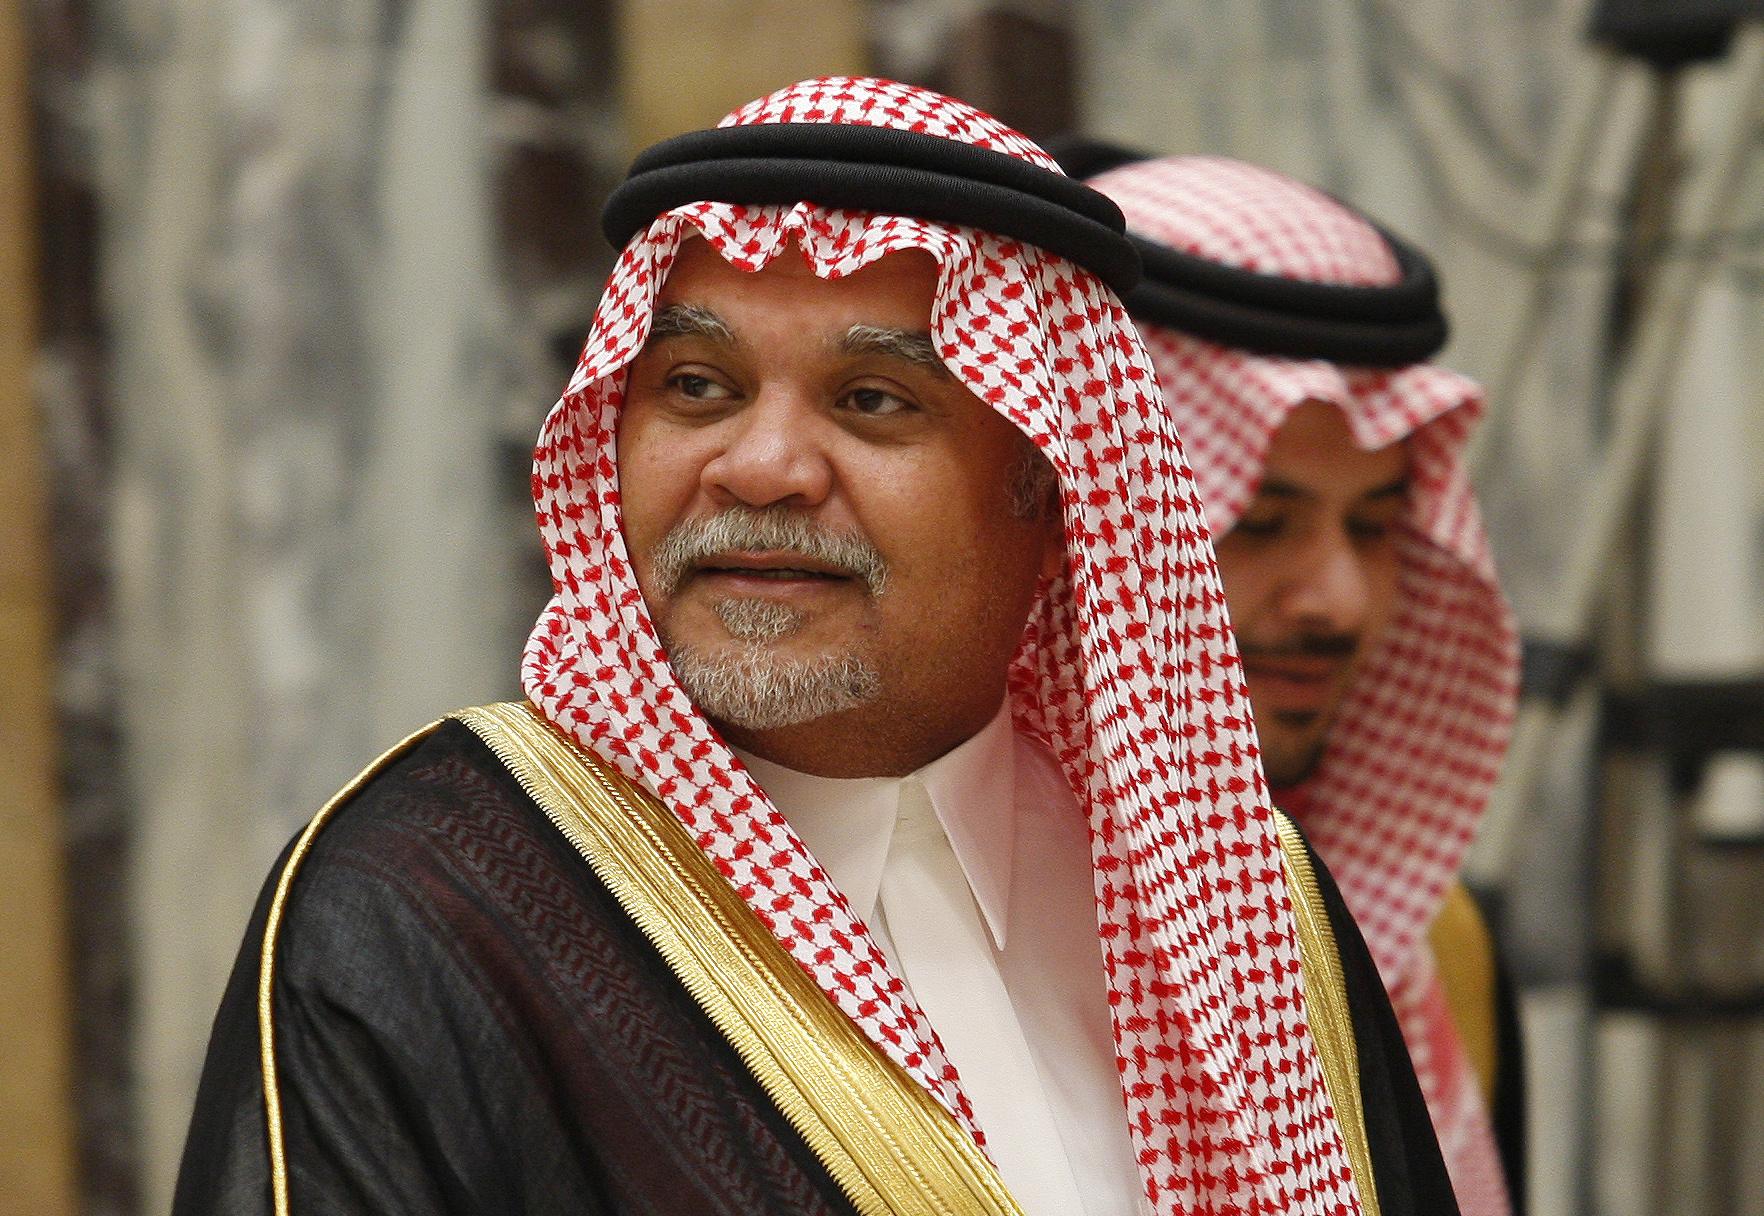 Bandar bin Sultan